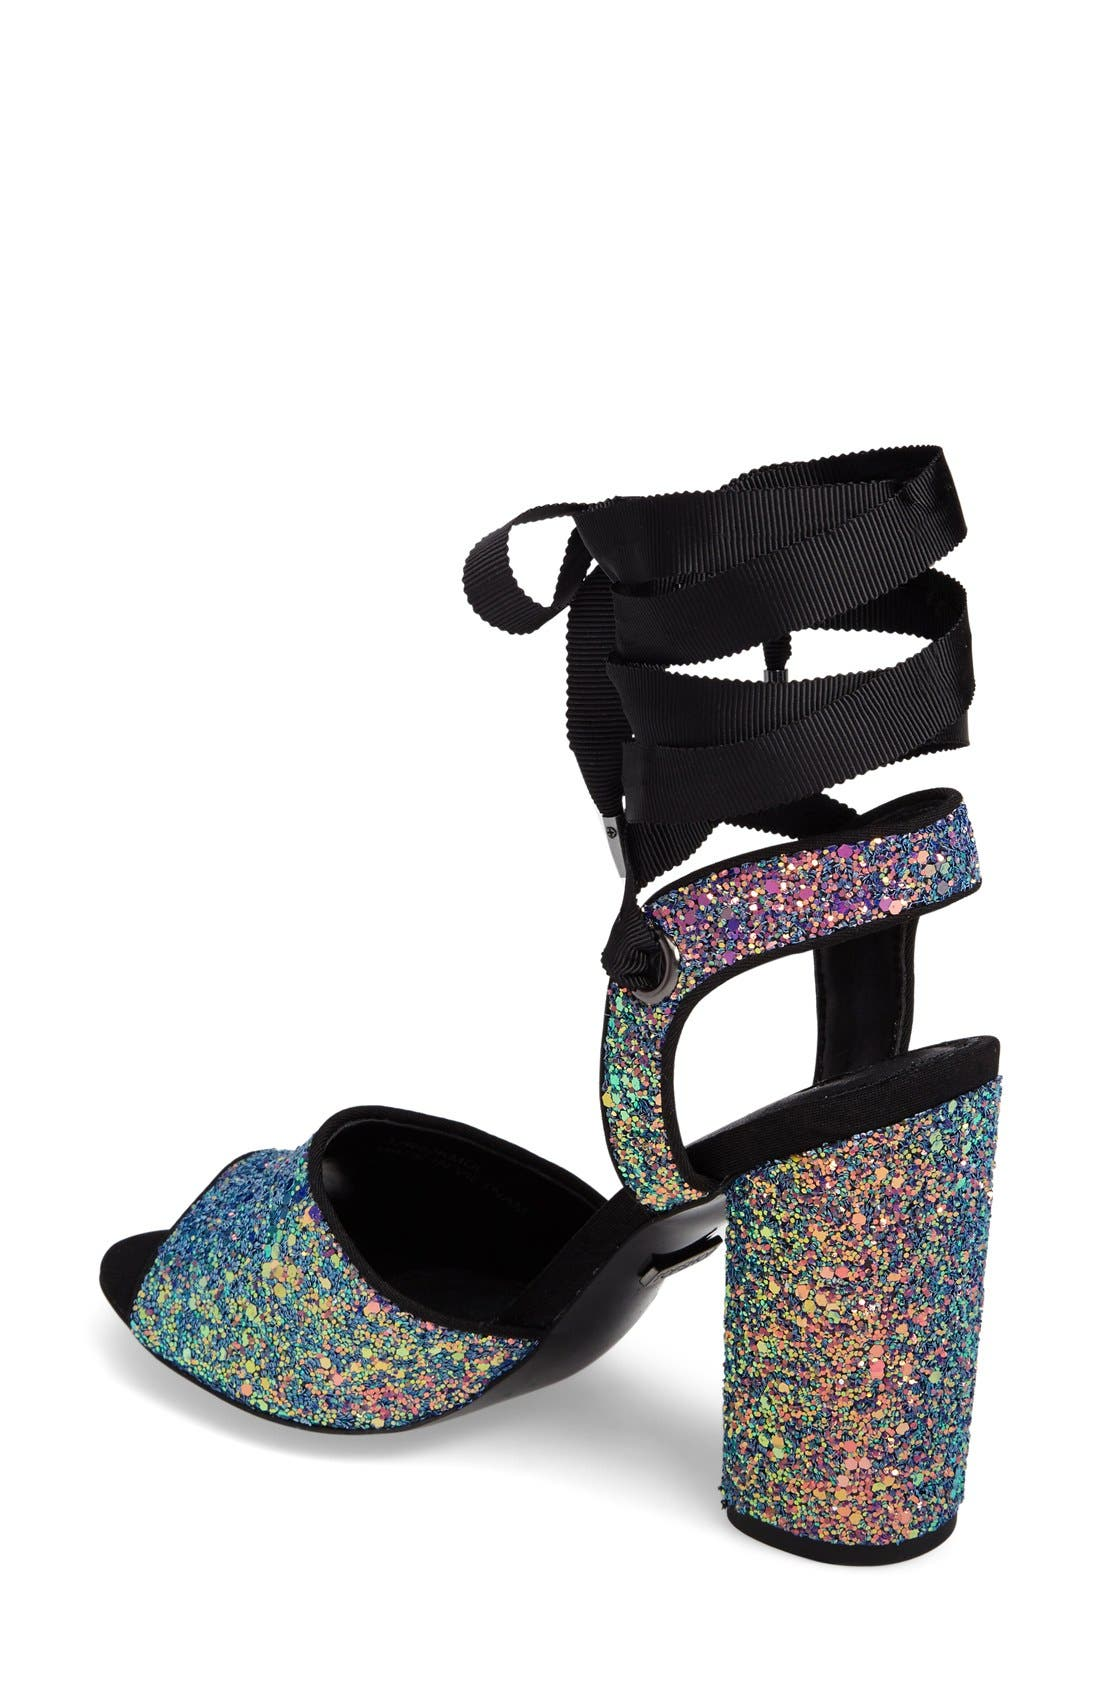 Alternate Image 2  - Topshop Royal Glitter Lace-Up Sandals (Women)